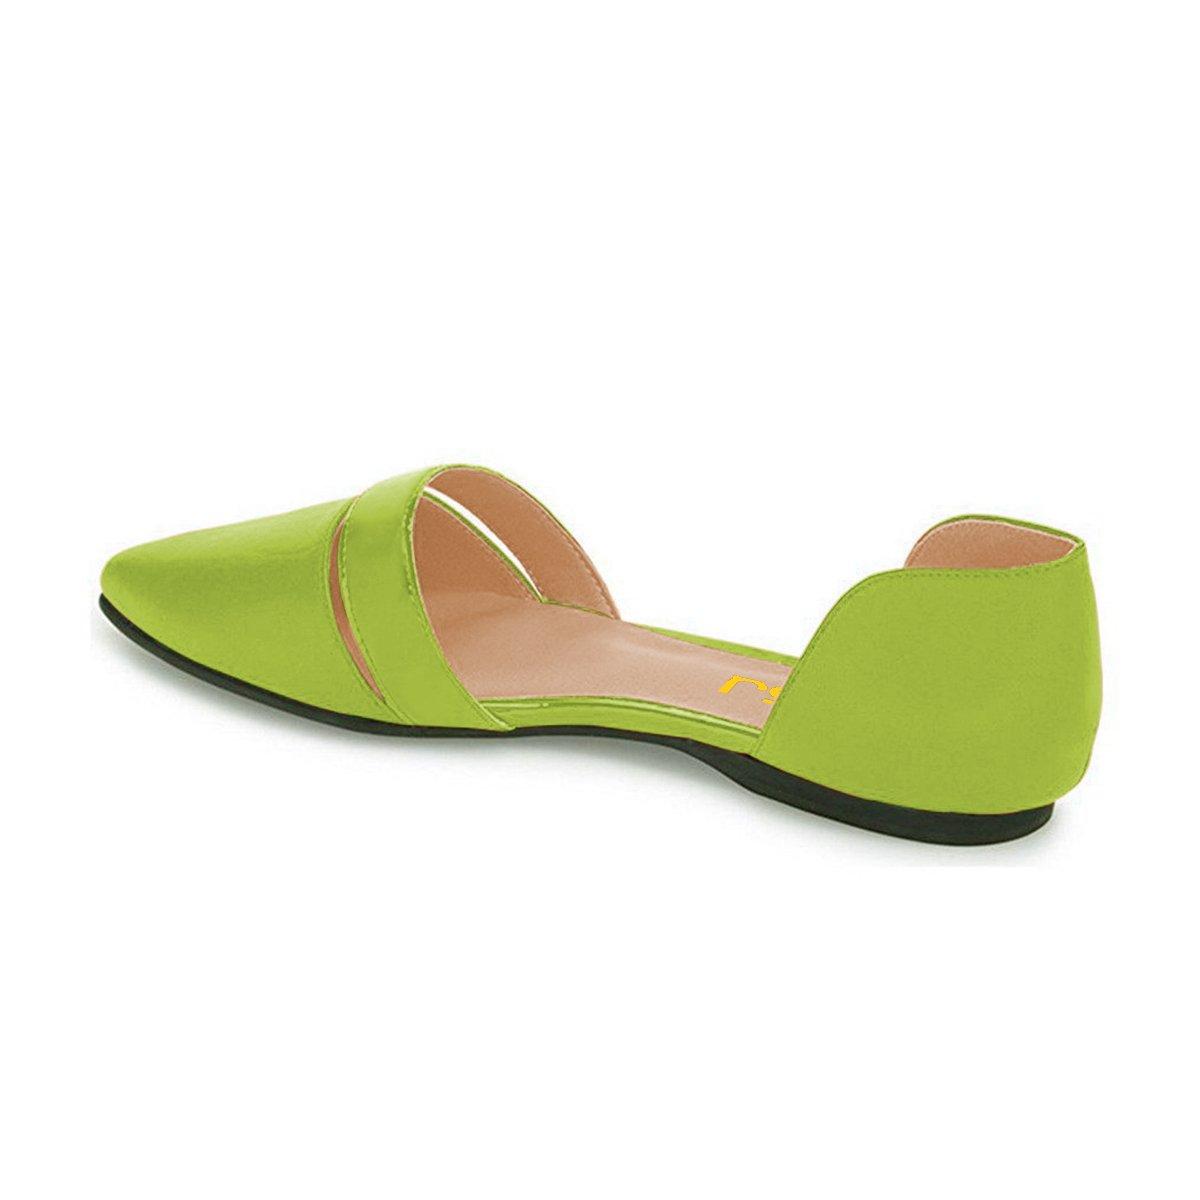 FSJ Women Cute D'Orsay Ballet Flats for Comfort Pointed Toe Low Heels Dress Shoes Size 4-15 US B06Y4CXTZJ 7 B(M) US|Green